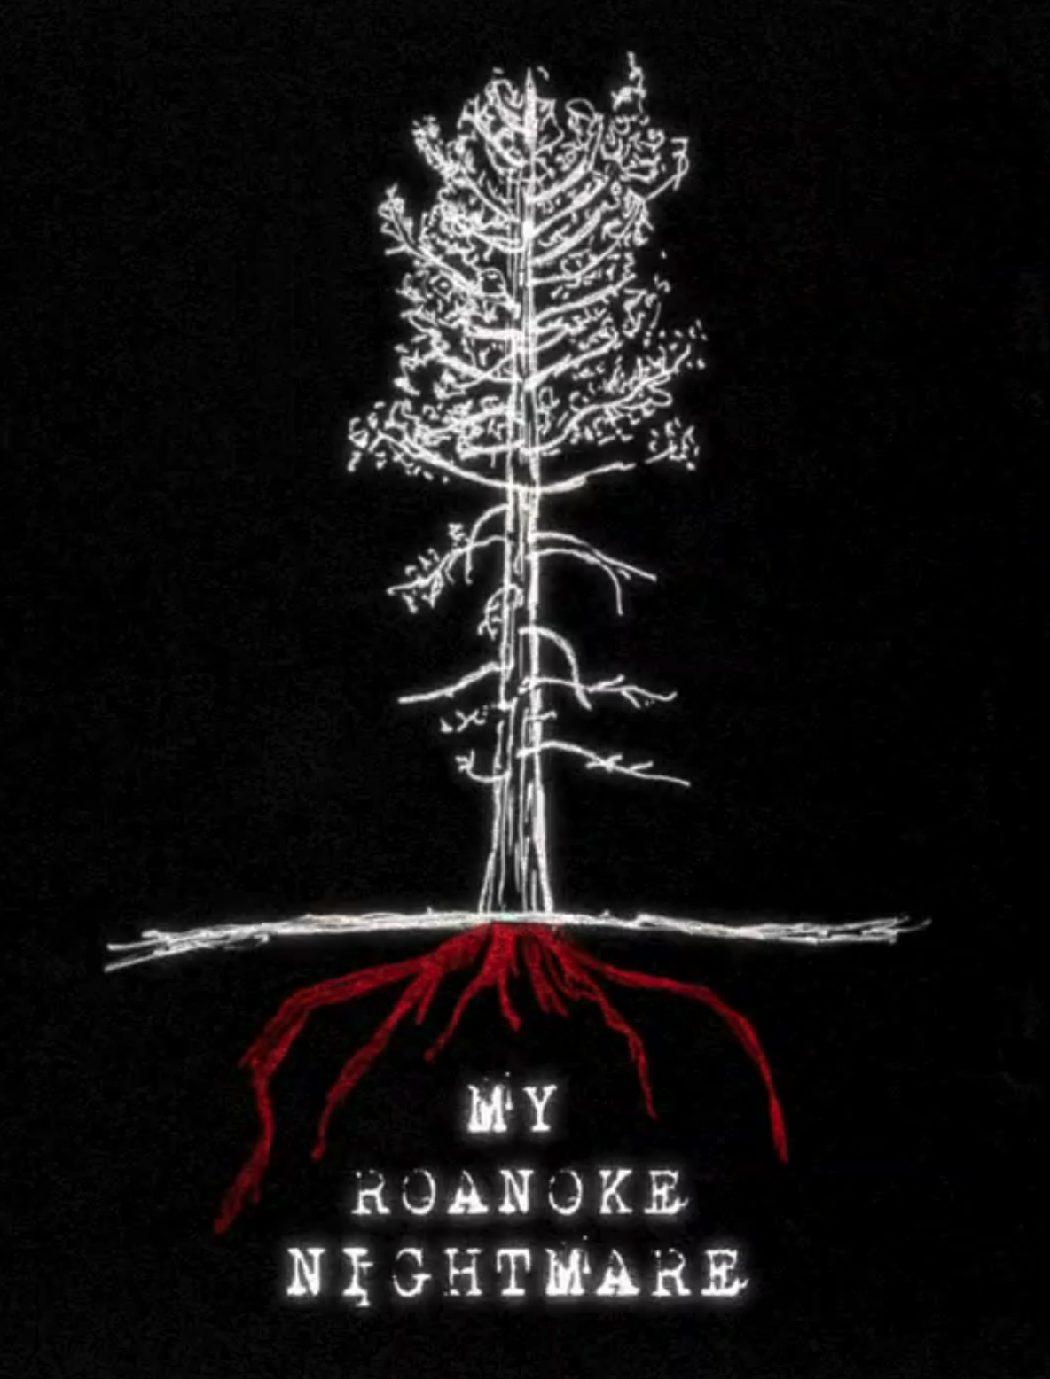 'My Roanoke Nightmare'